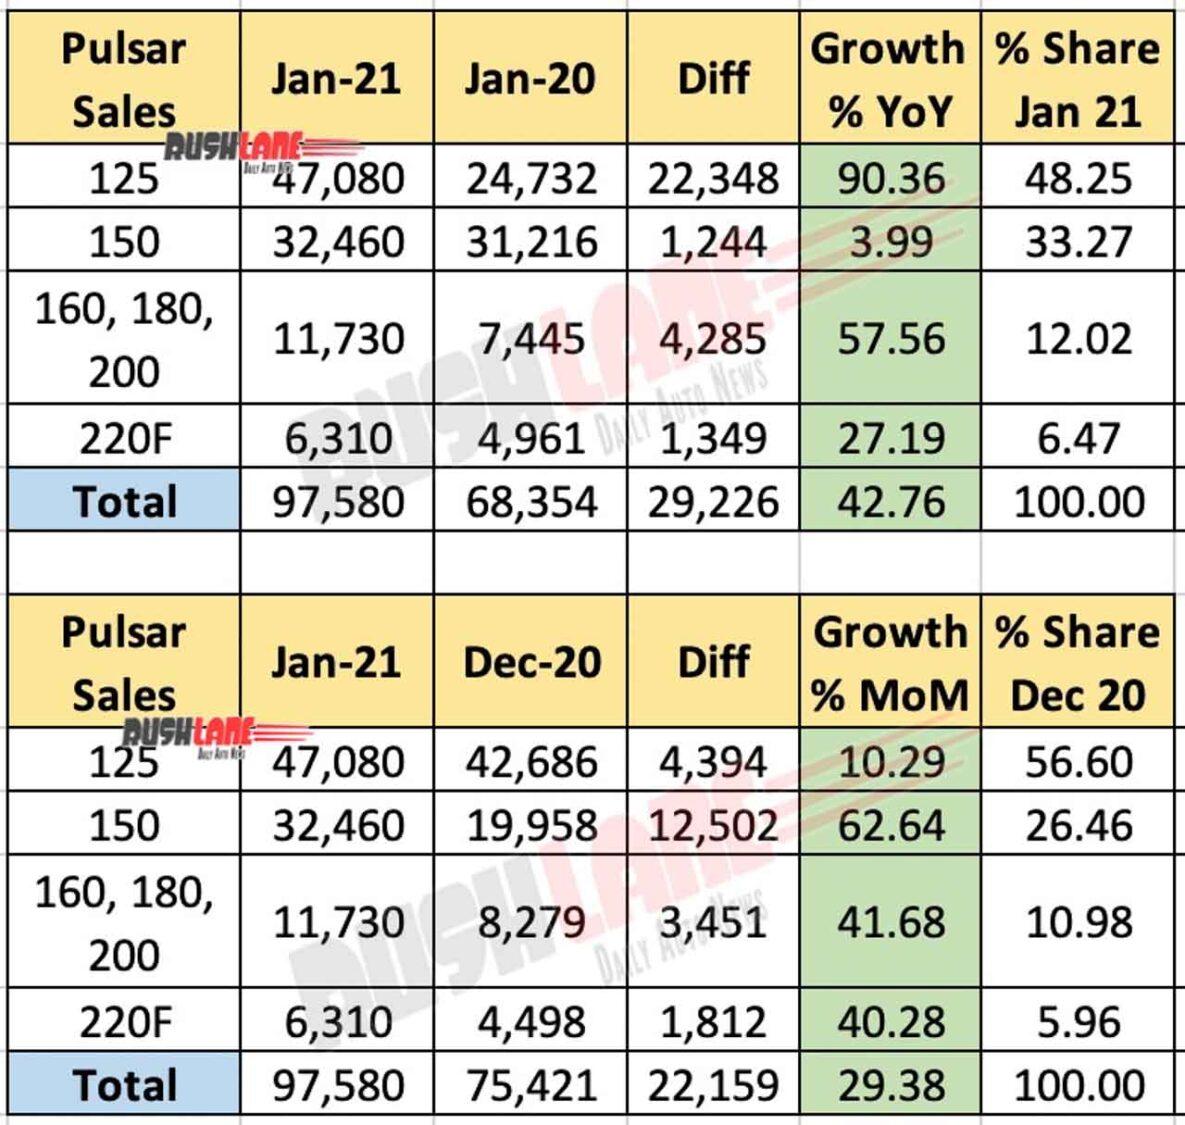 Bajaj Pulsar Domestic Sales Jan 2021